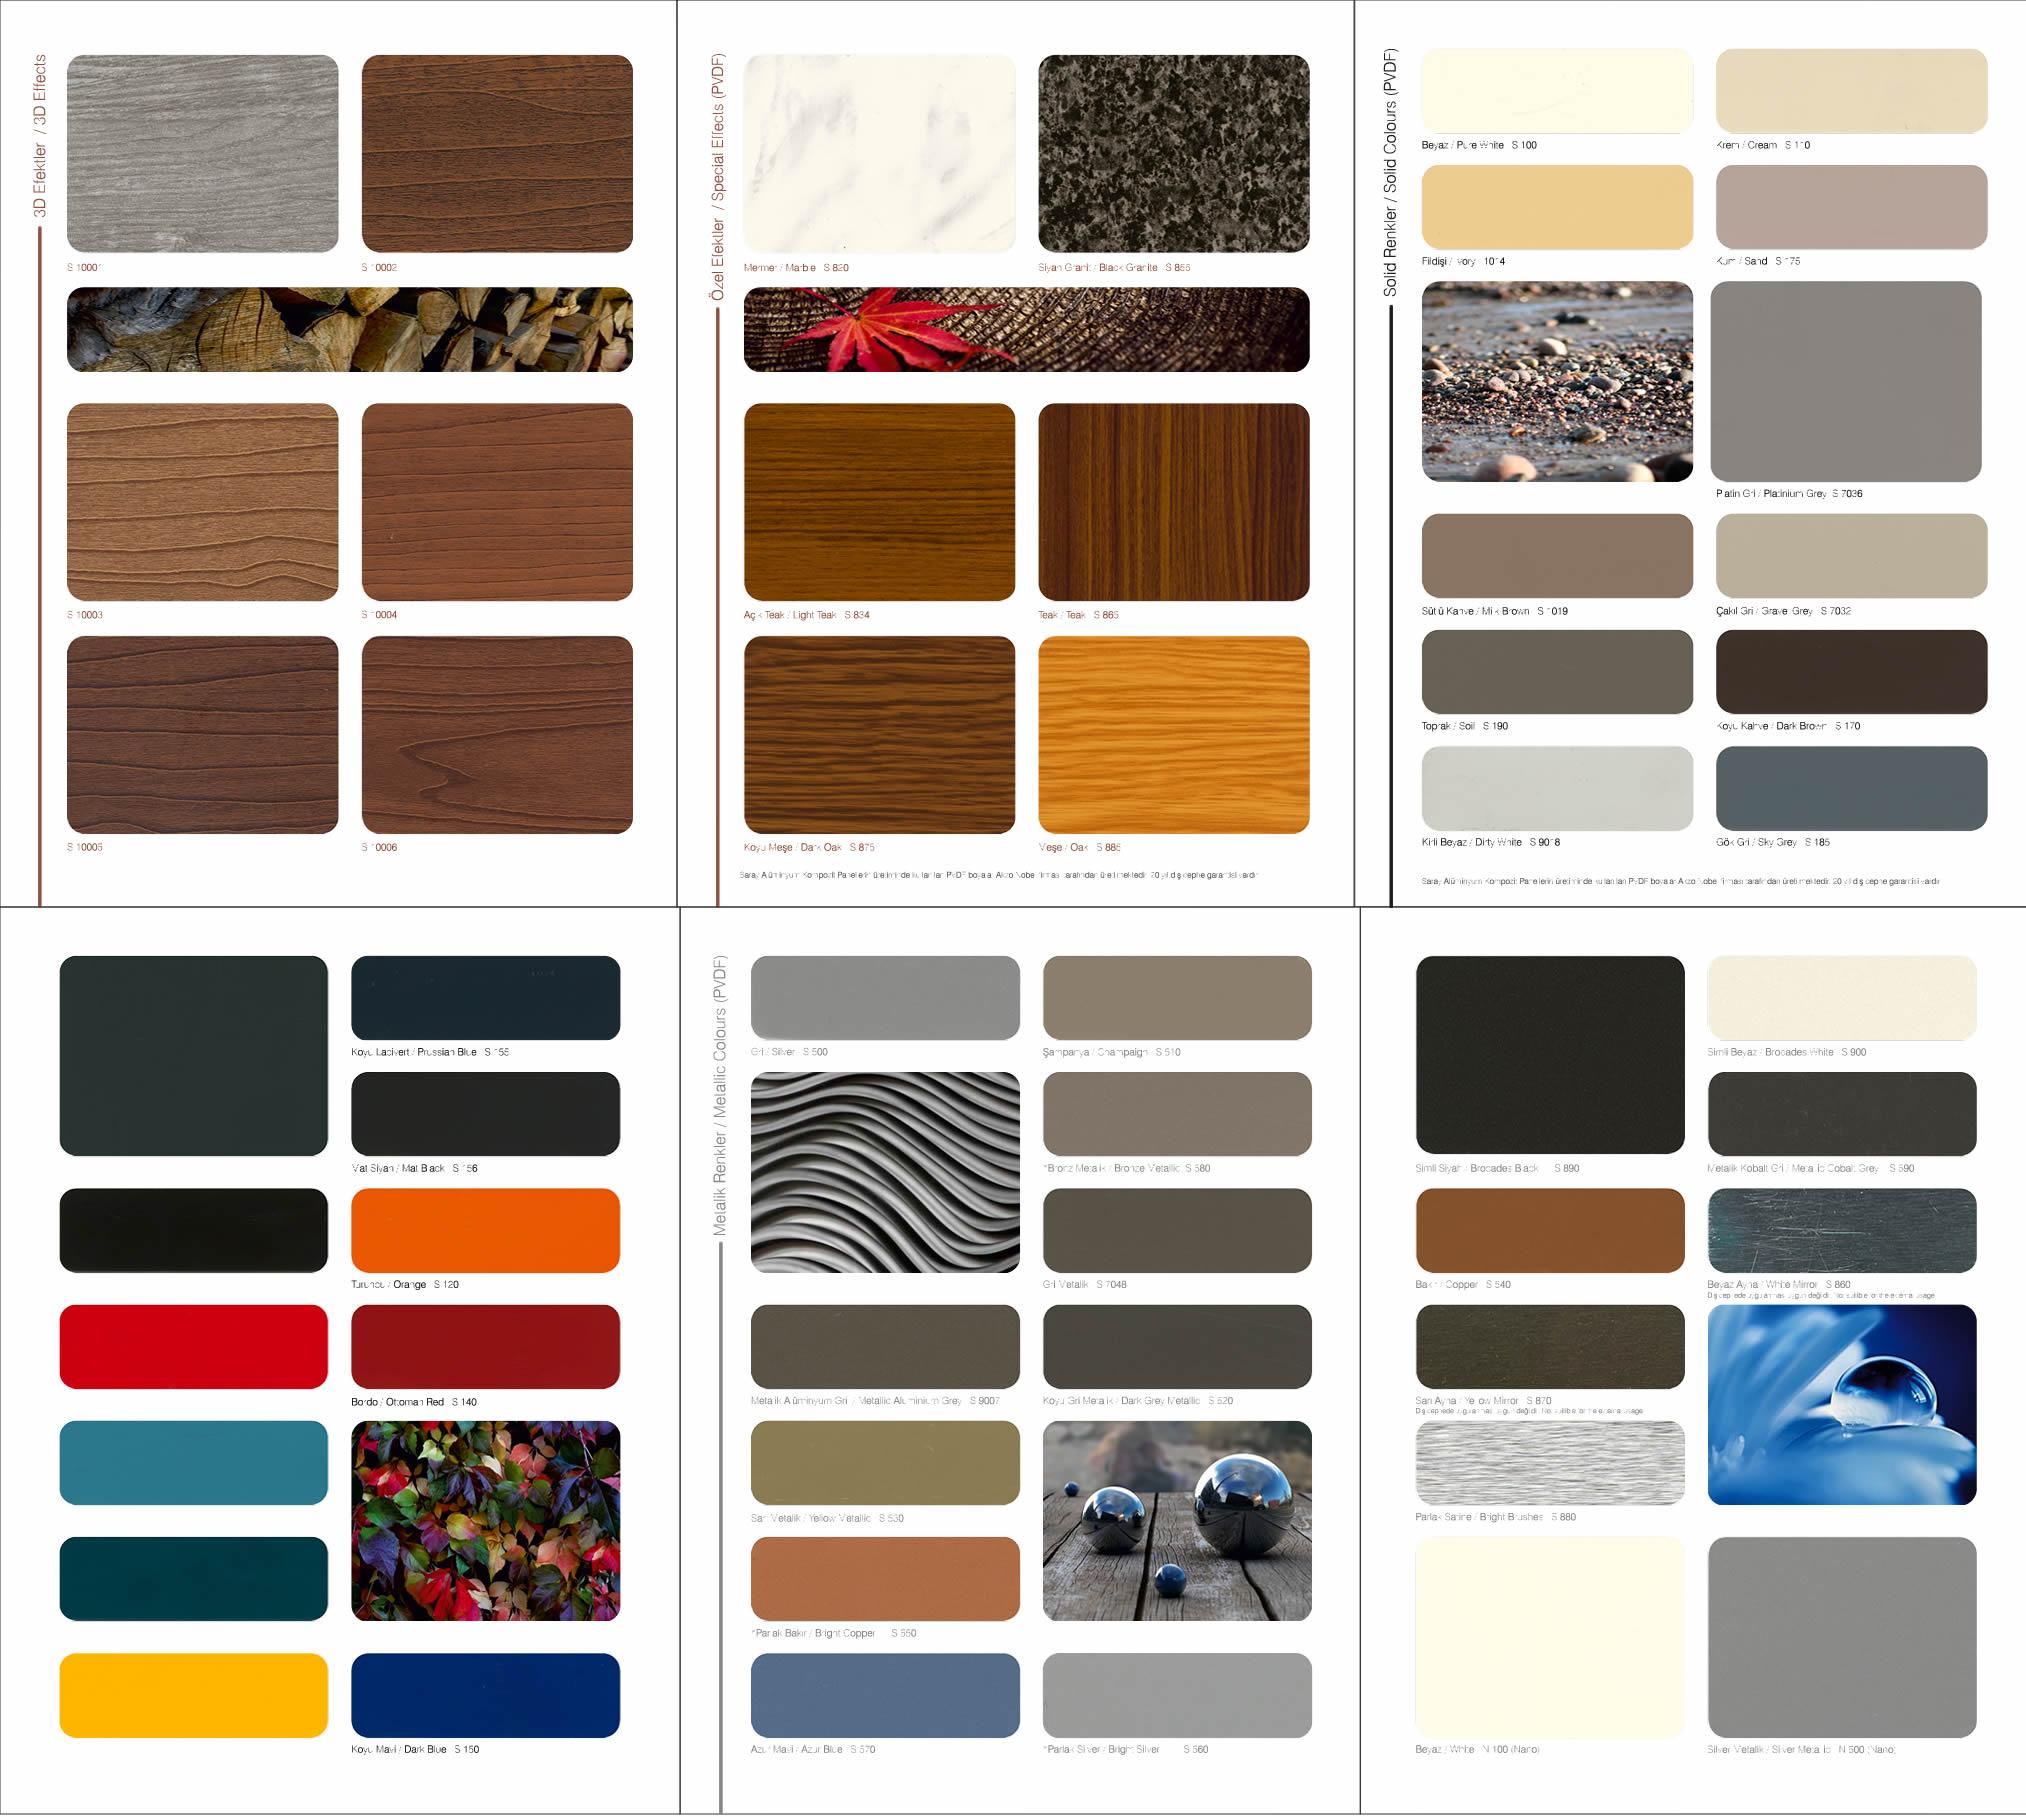 Canlar alminyum saray alminyum composite panels nvjuhfo Image collections